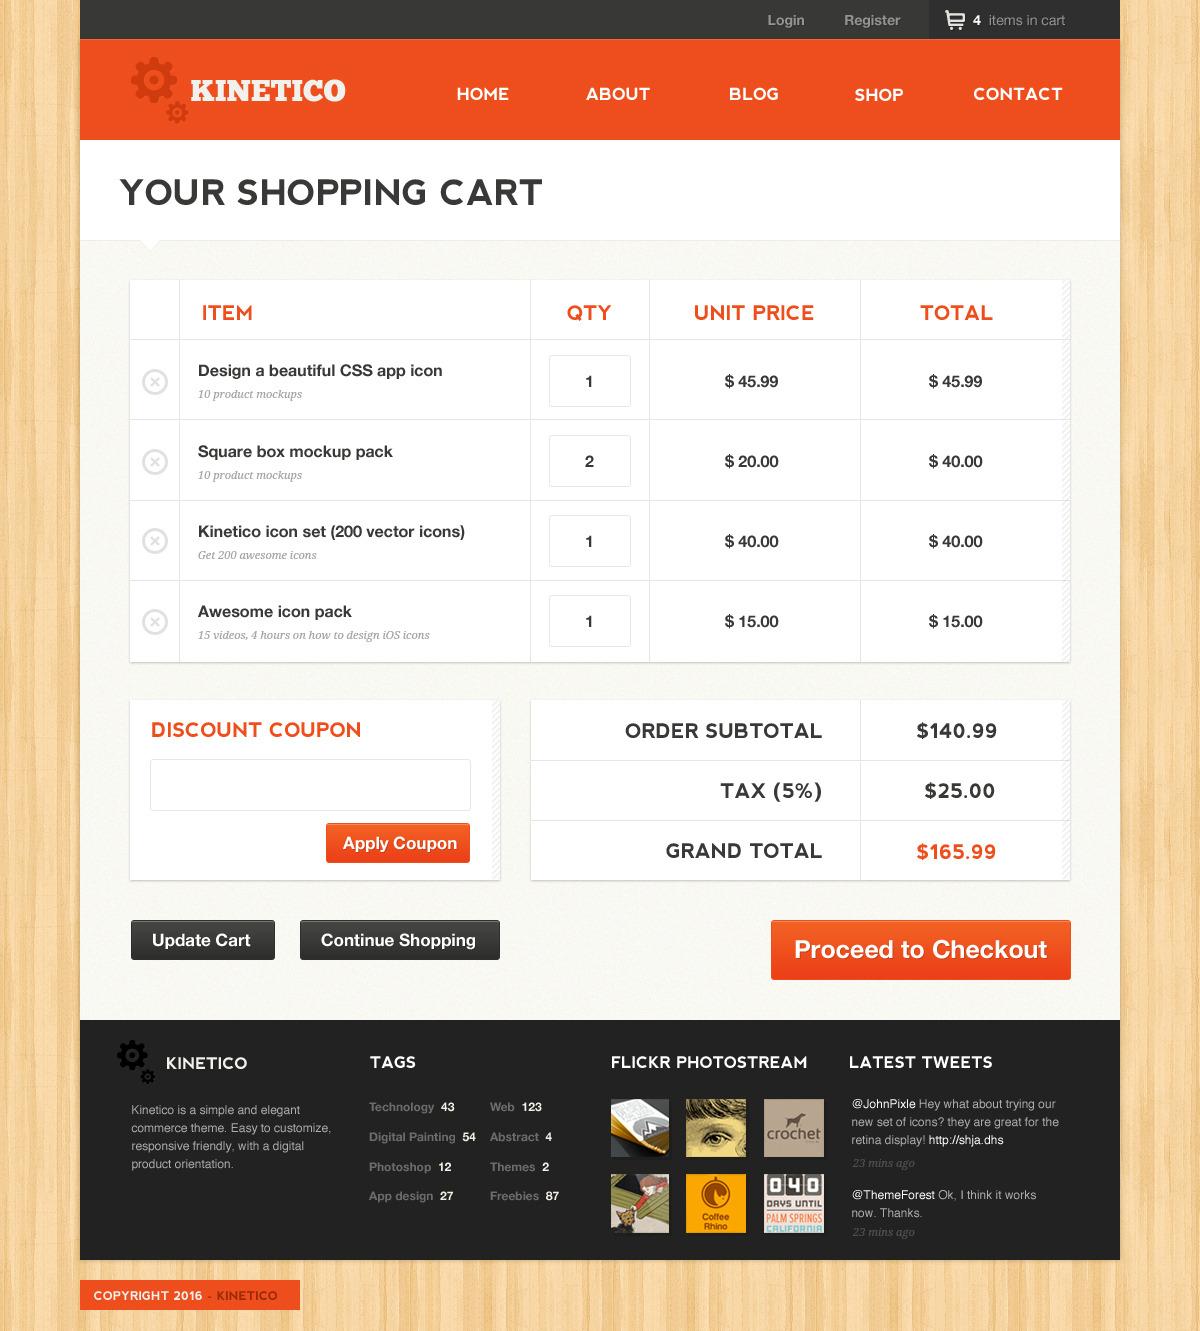 Kinetico - A responsive-friendly, E-Commerce theme